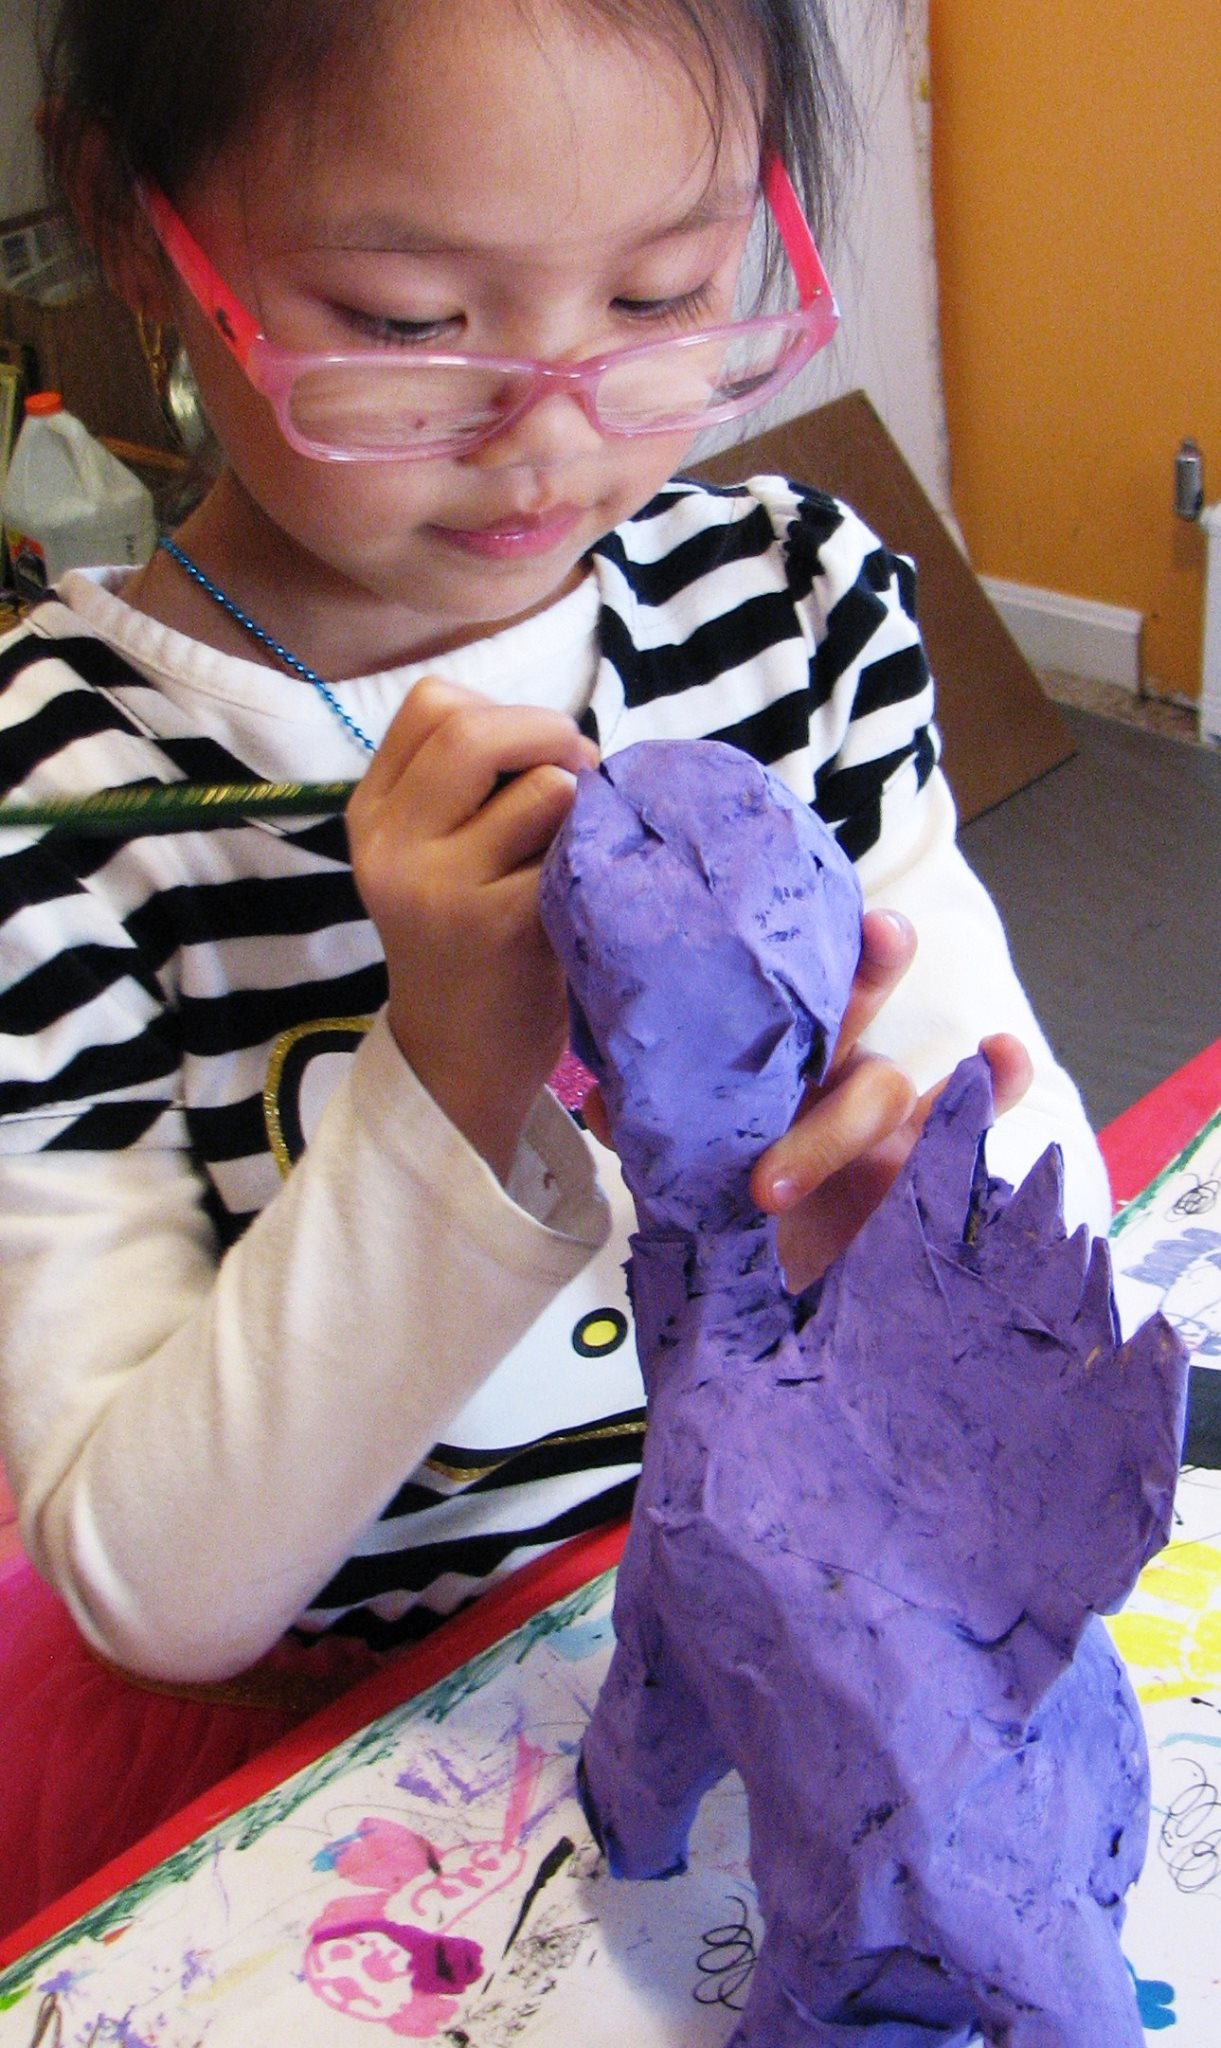 kid artist 2.jpg